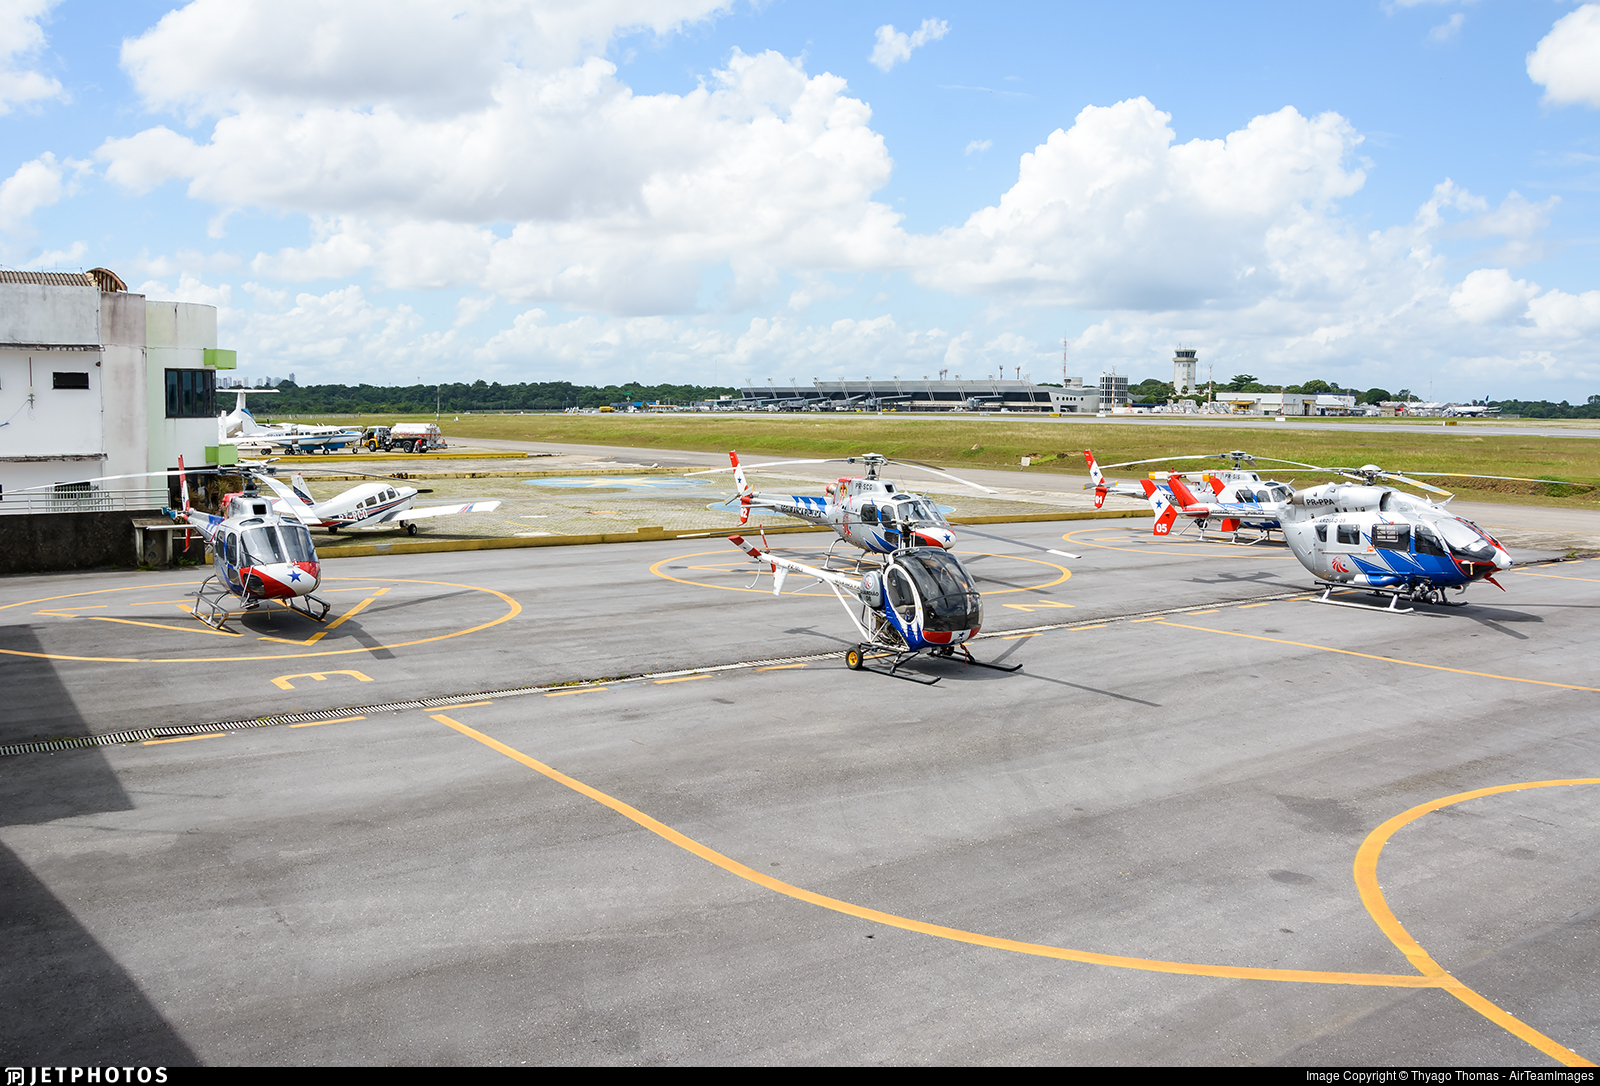 SBBE - Airport - Ramp